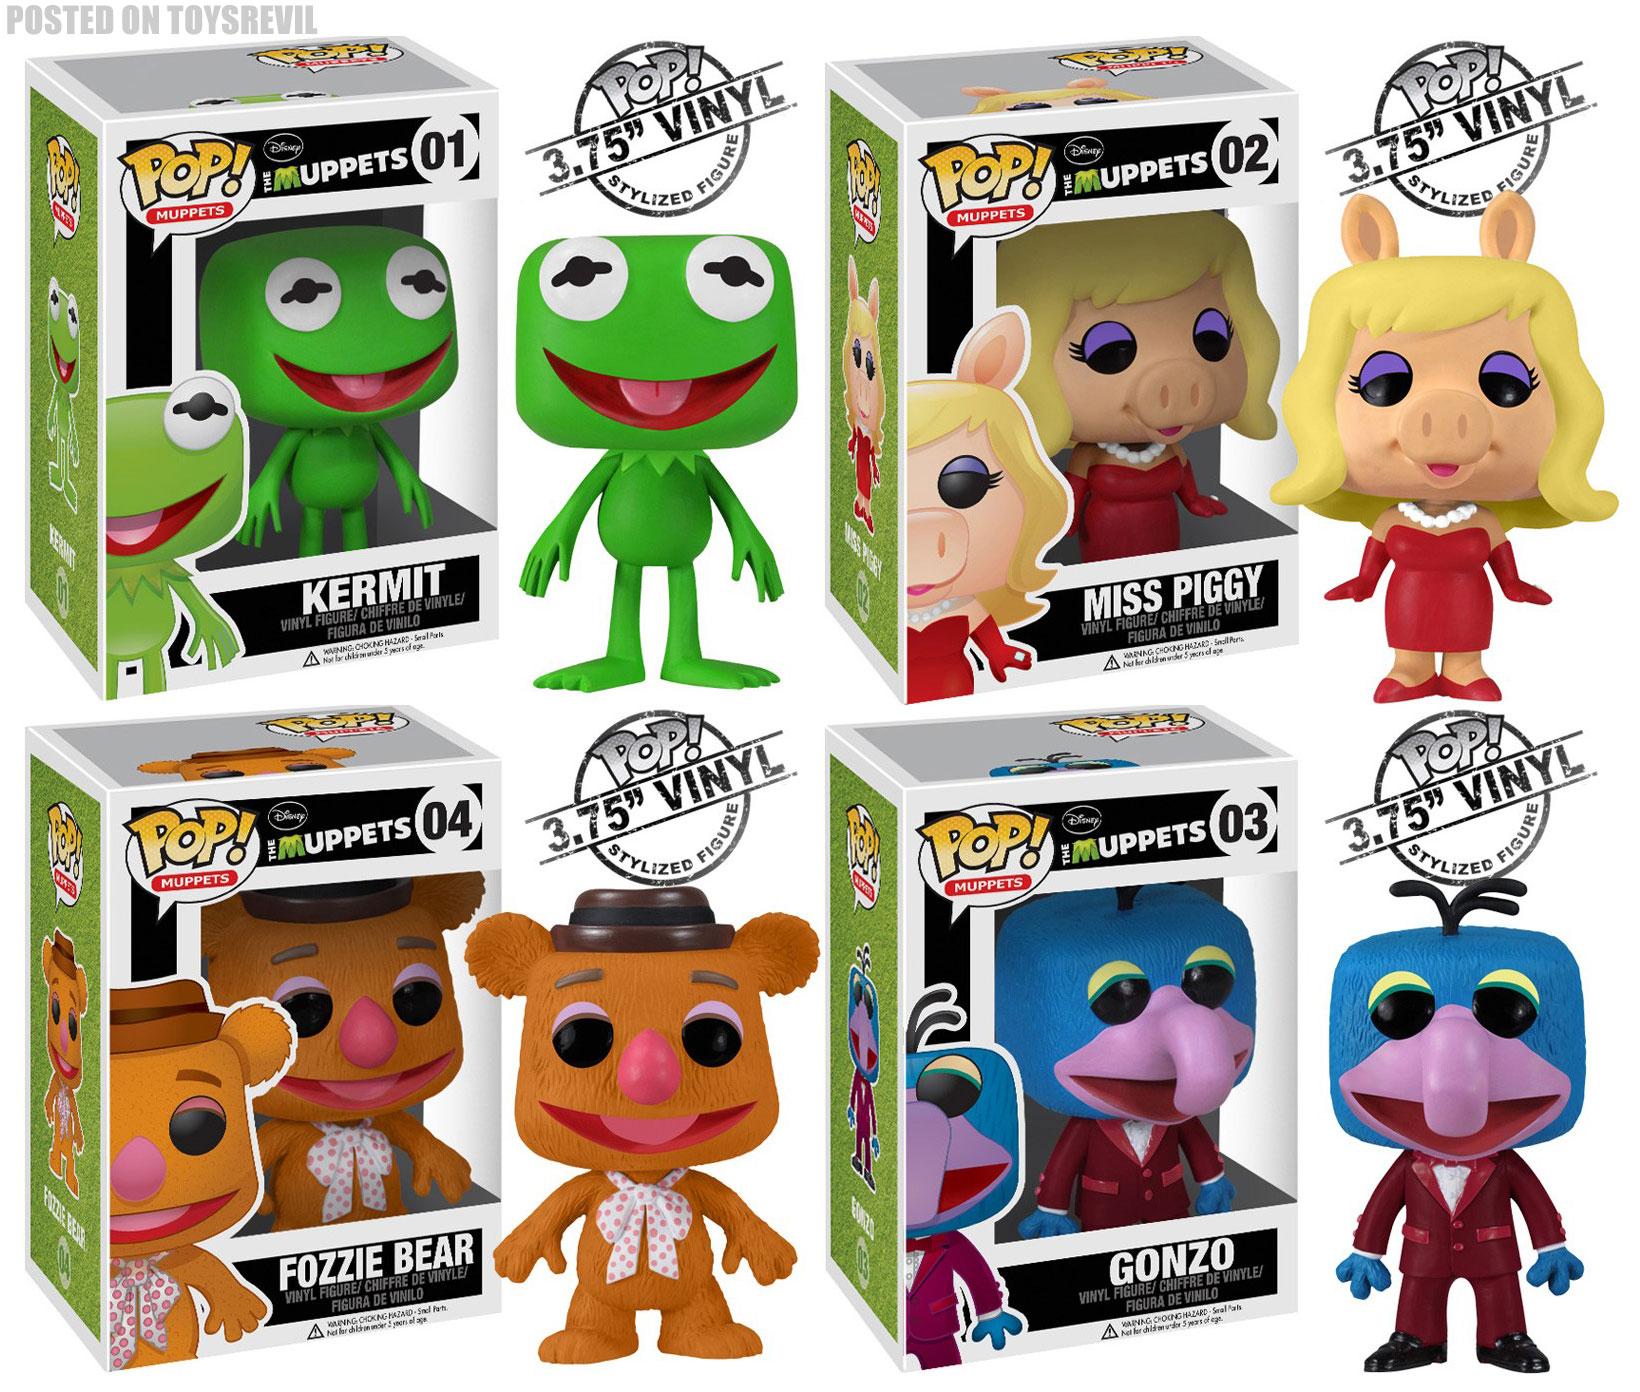 Pop Muppets From Funko